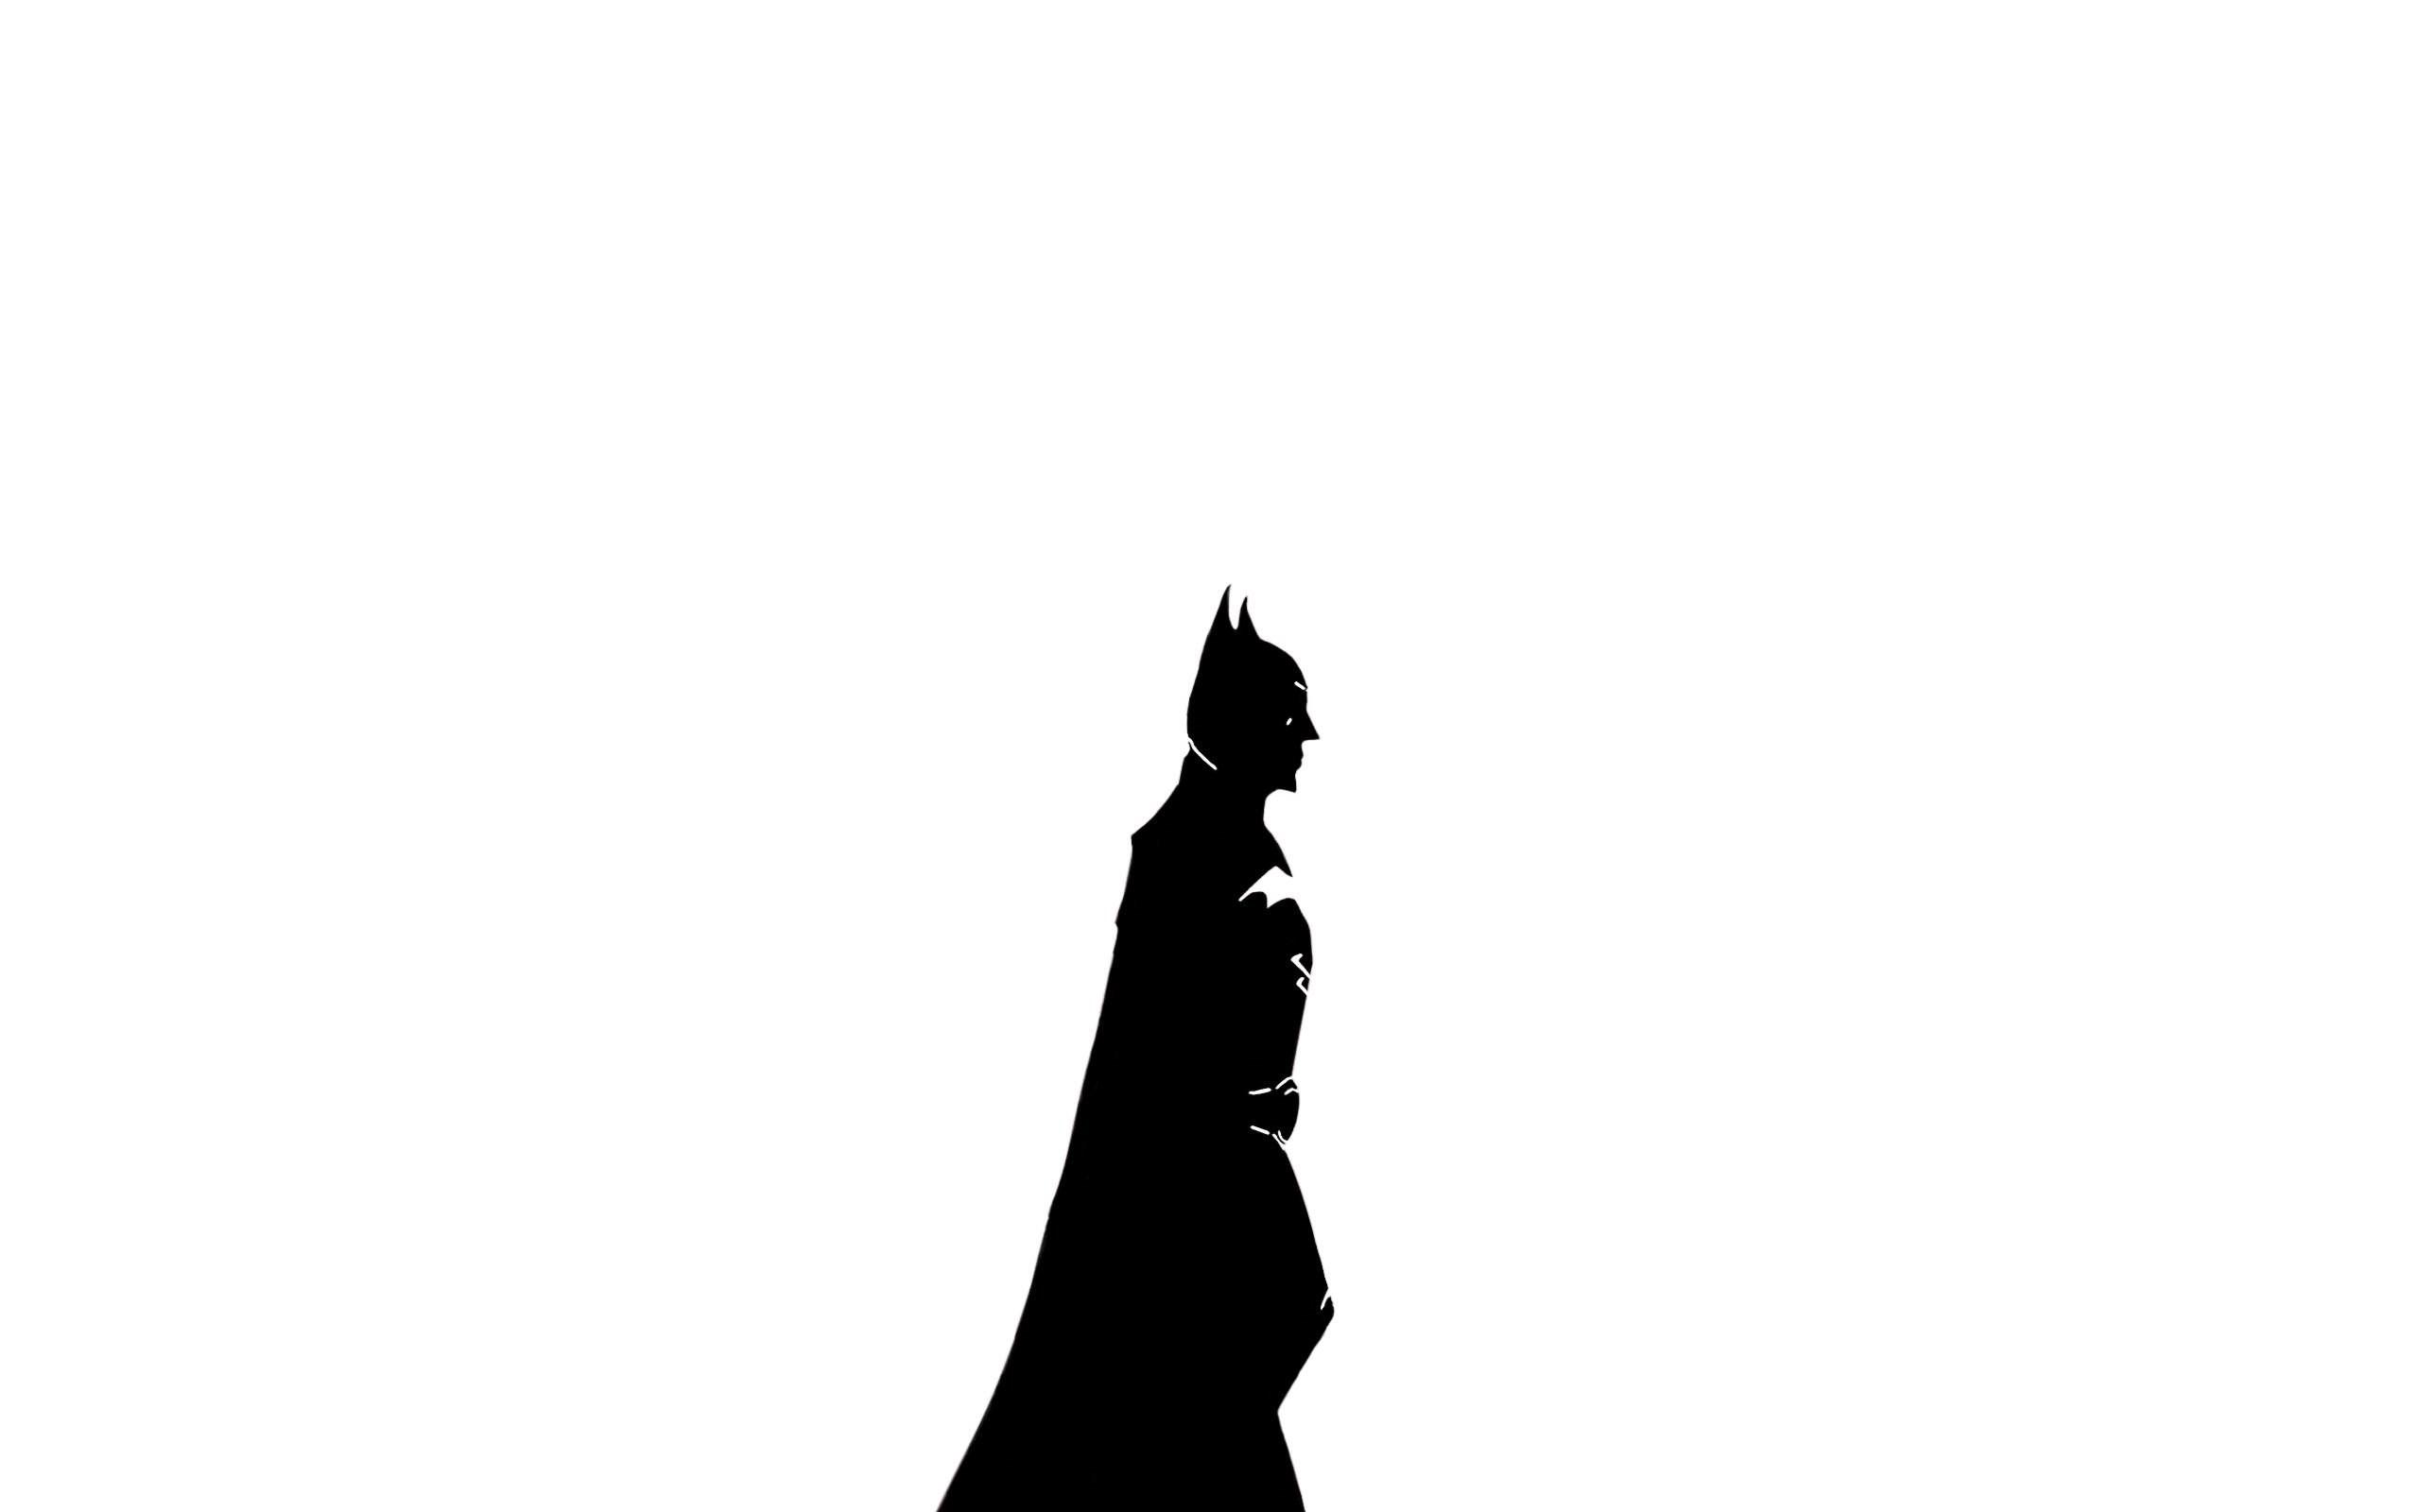 Batman Wallpaper White Version By Zachzaki On Deviantart Desktop